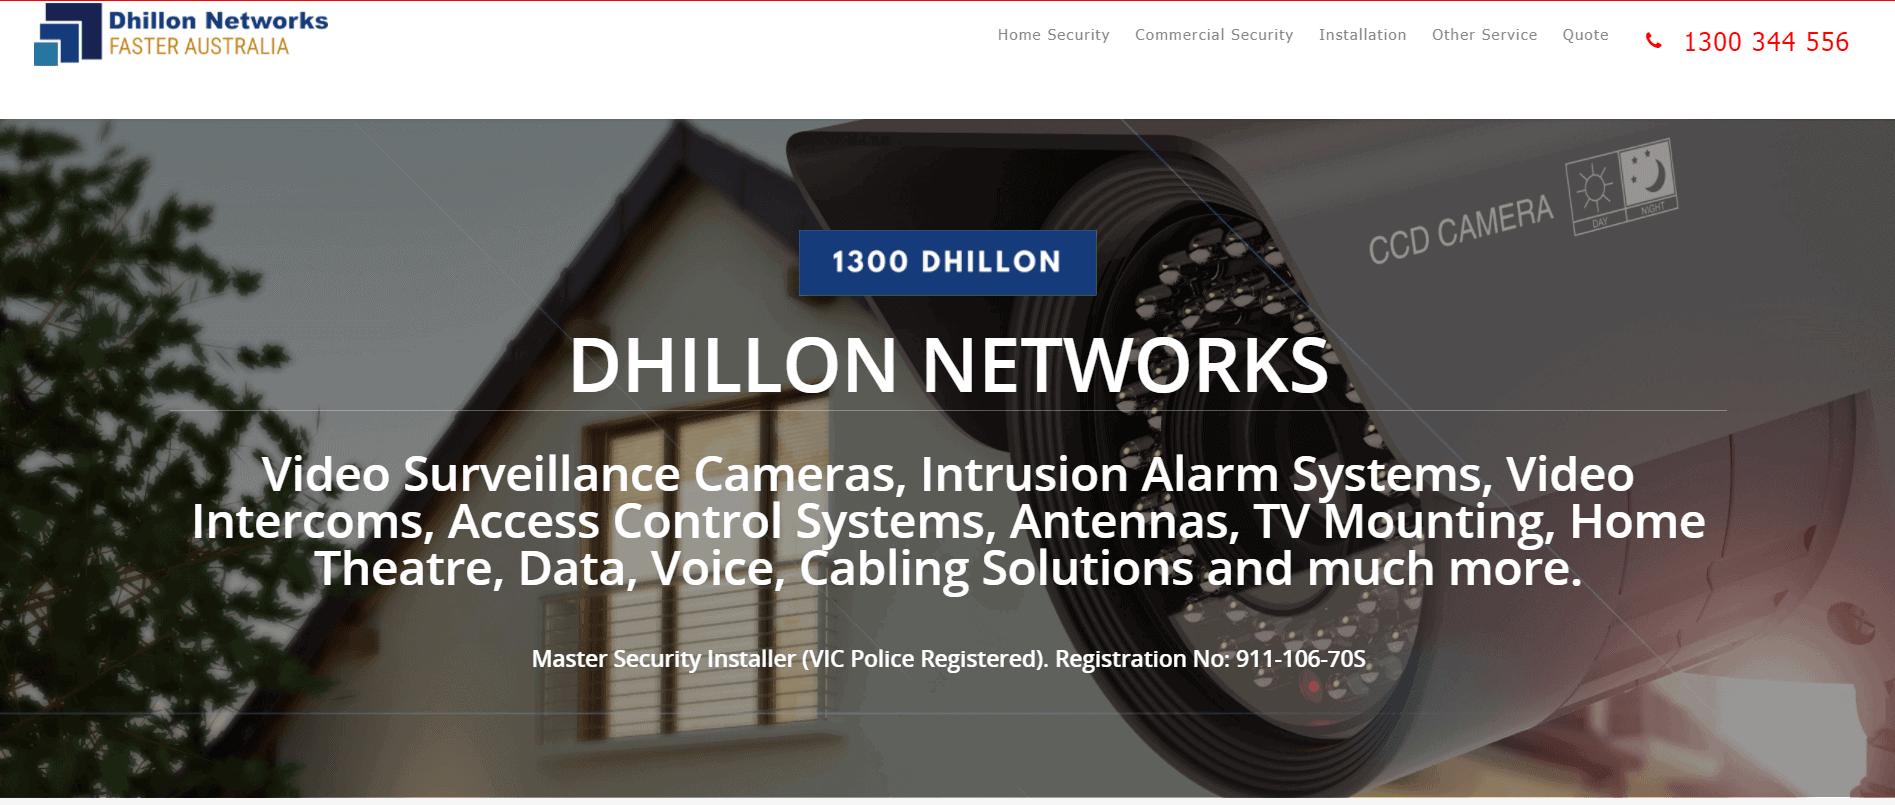 dhillon networks